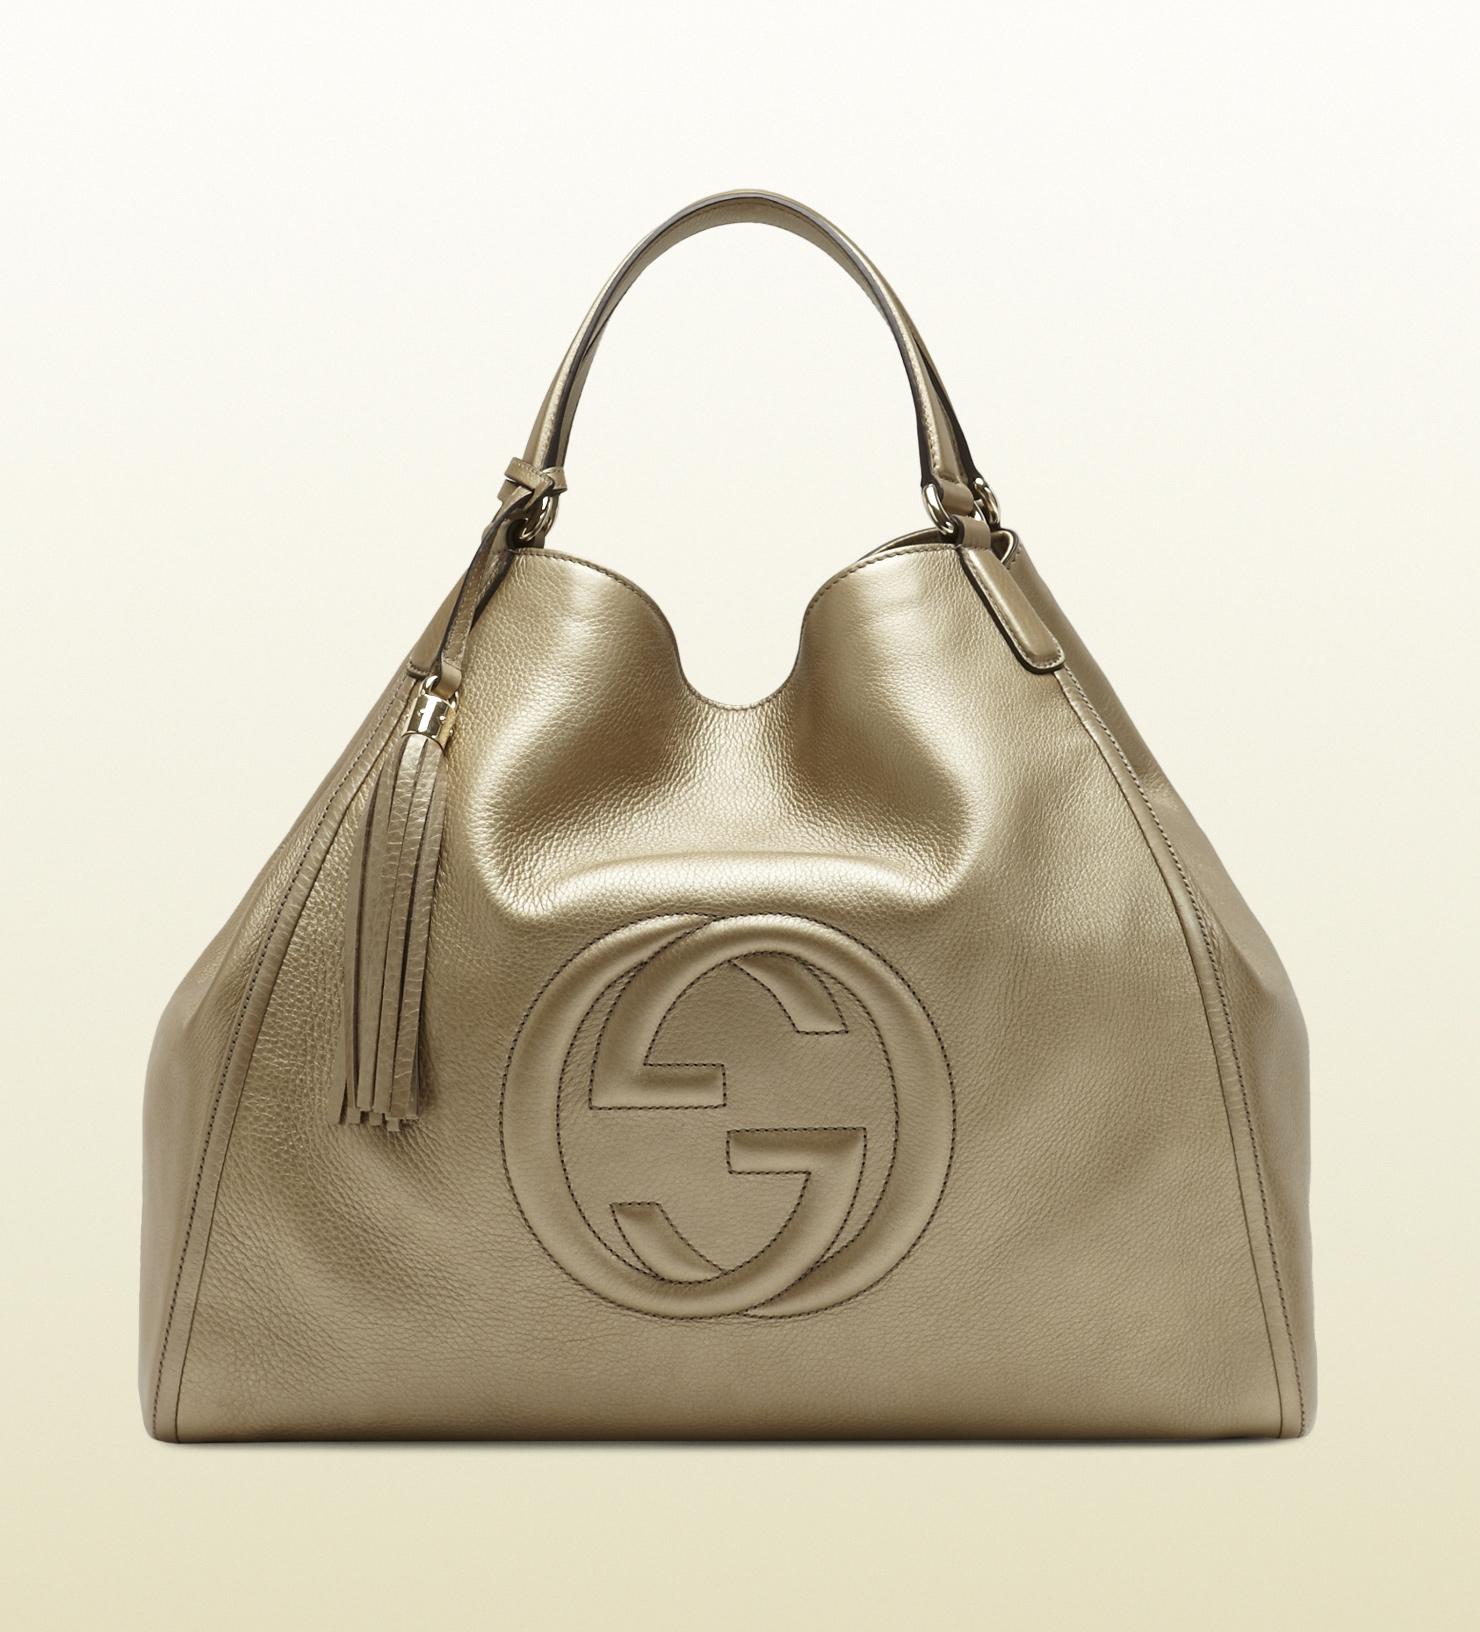 gucci soho metallic leather shoulder bag in green